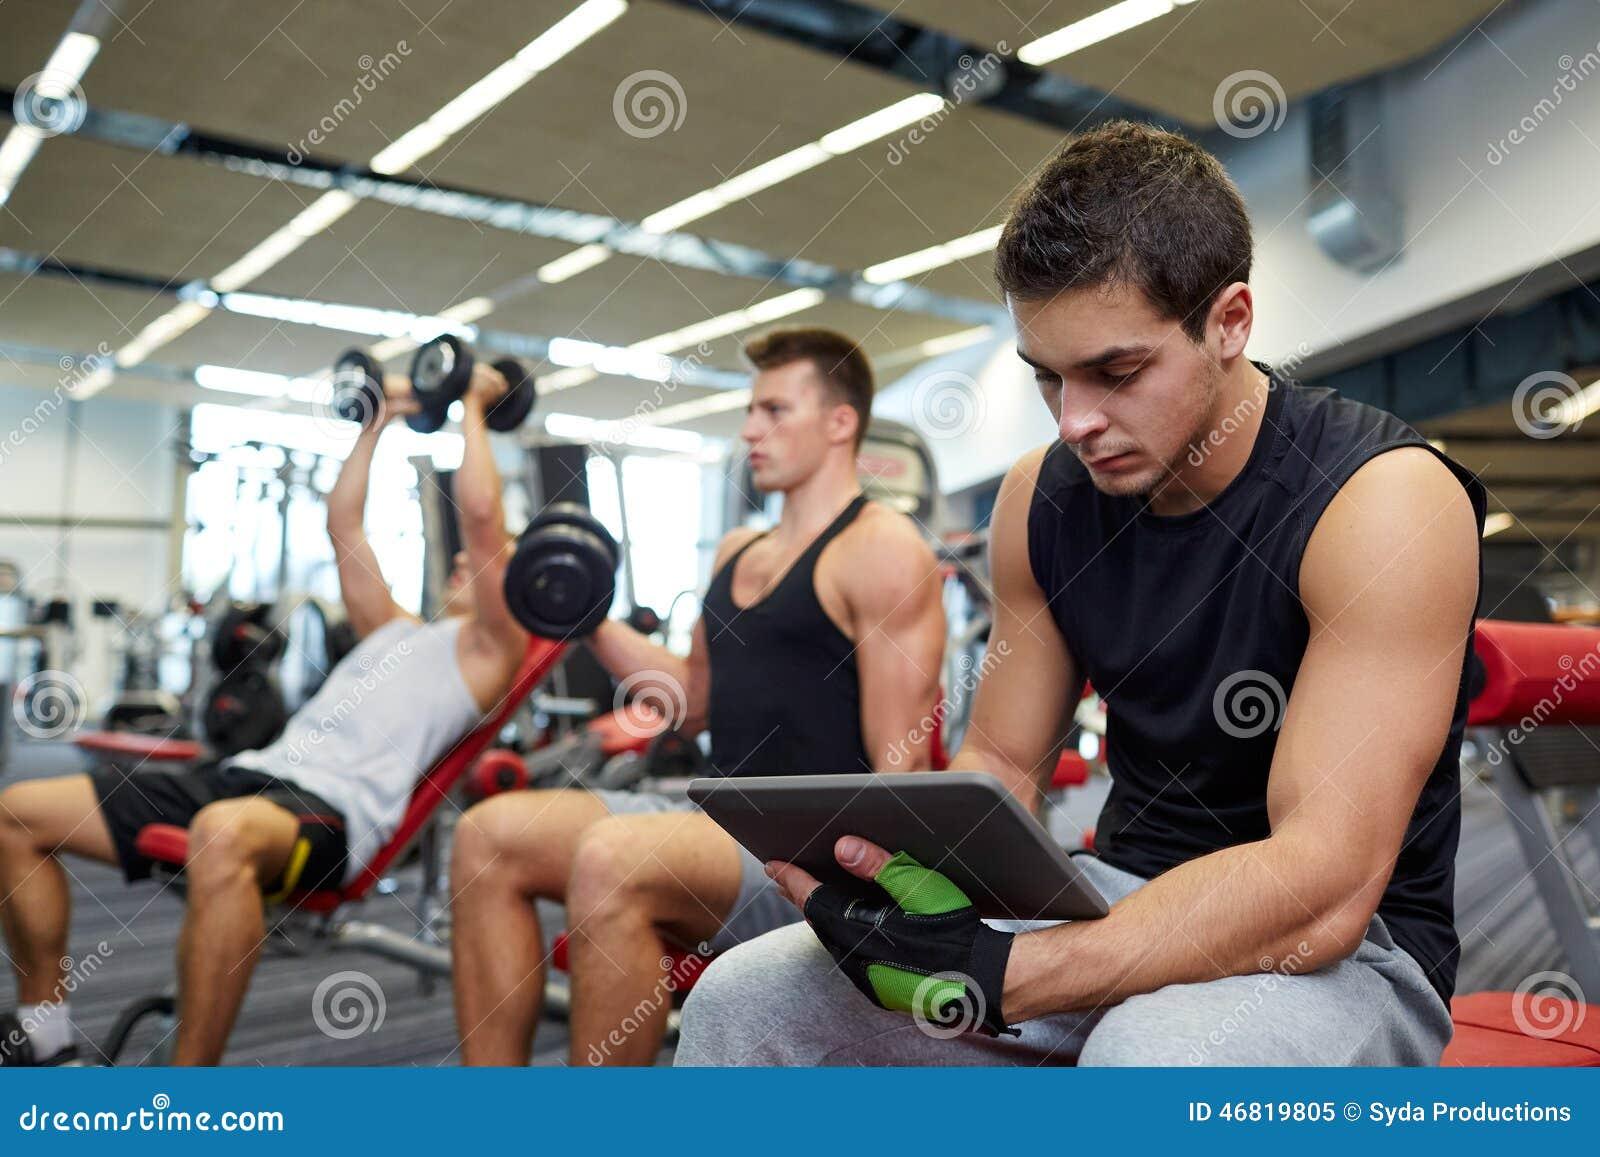 Bodybuilding Group 103